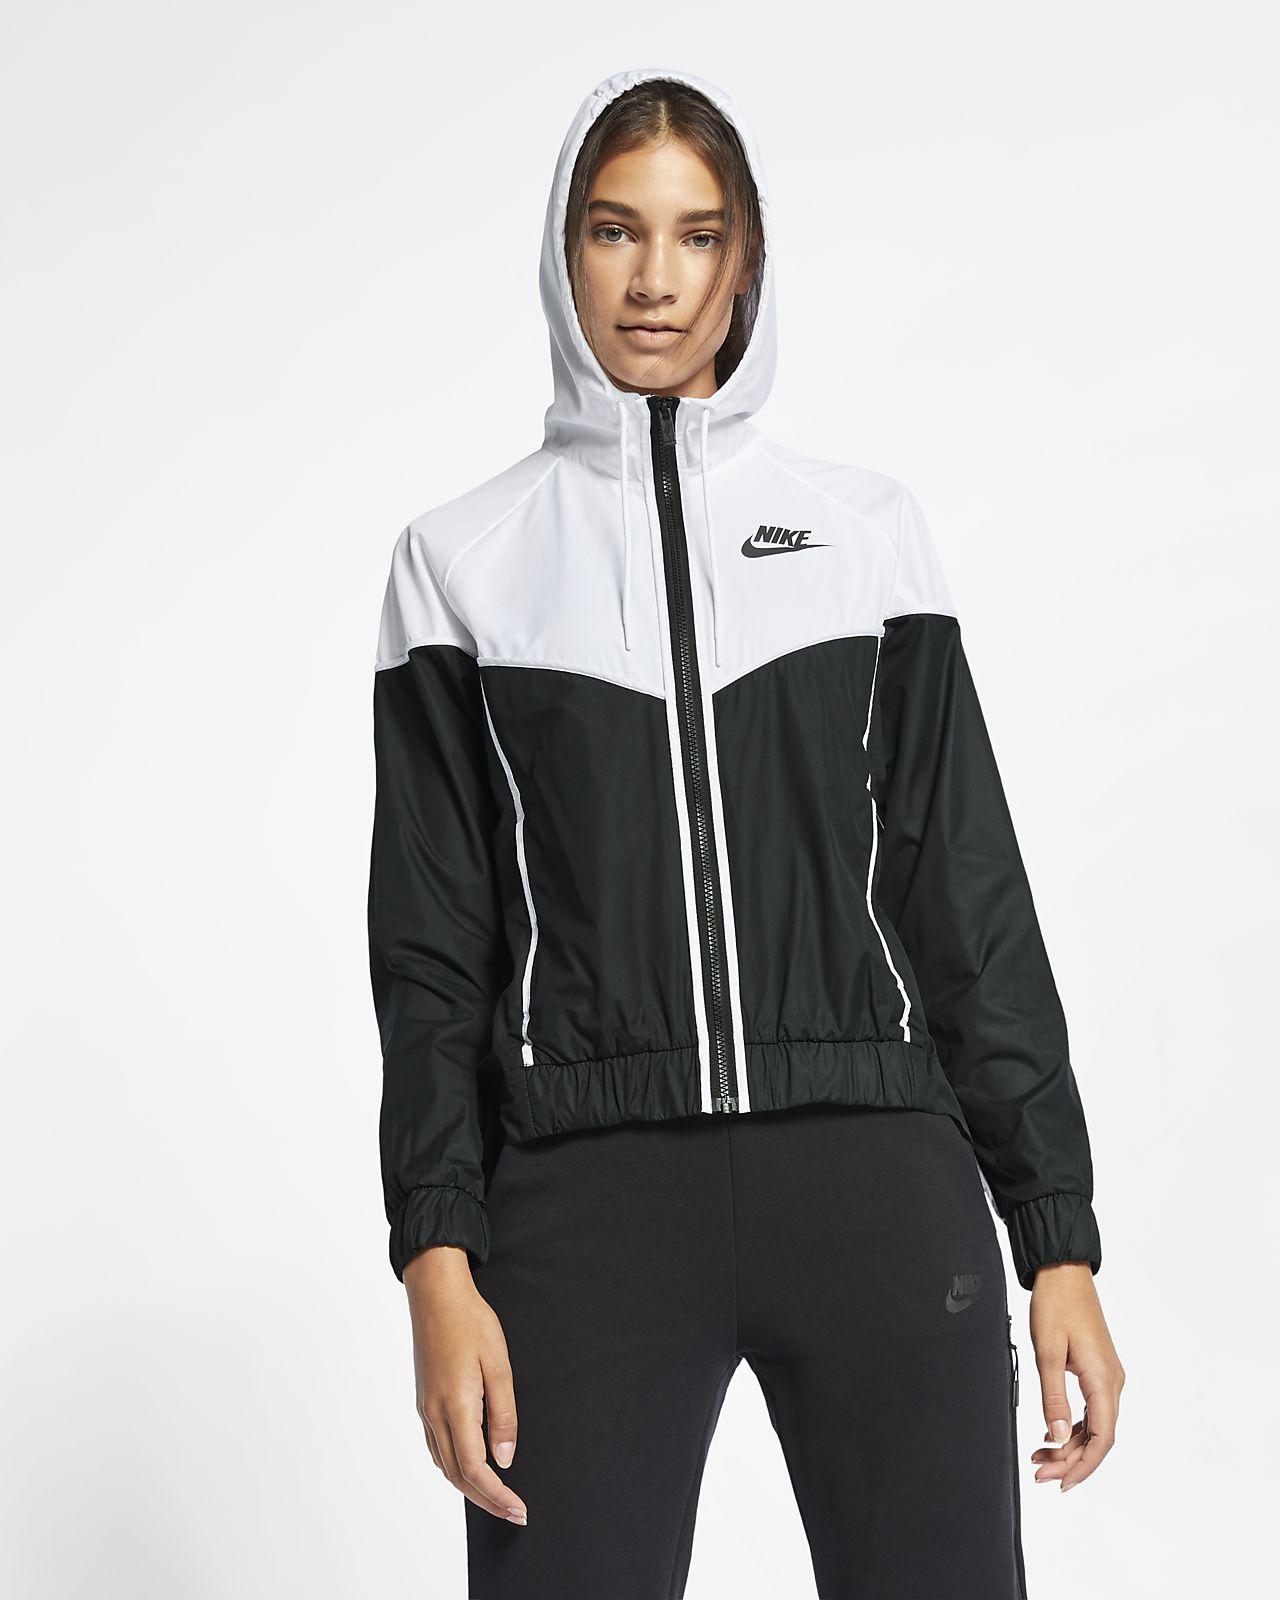 Femme Windrunner Sportswear Vent Pour Fr Nike Tissé Coupe BwpqxPYP